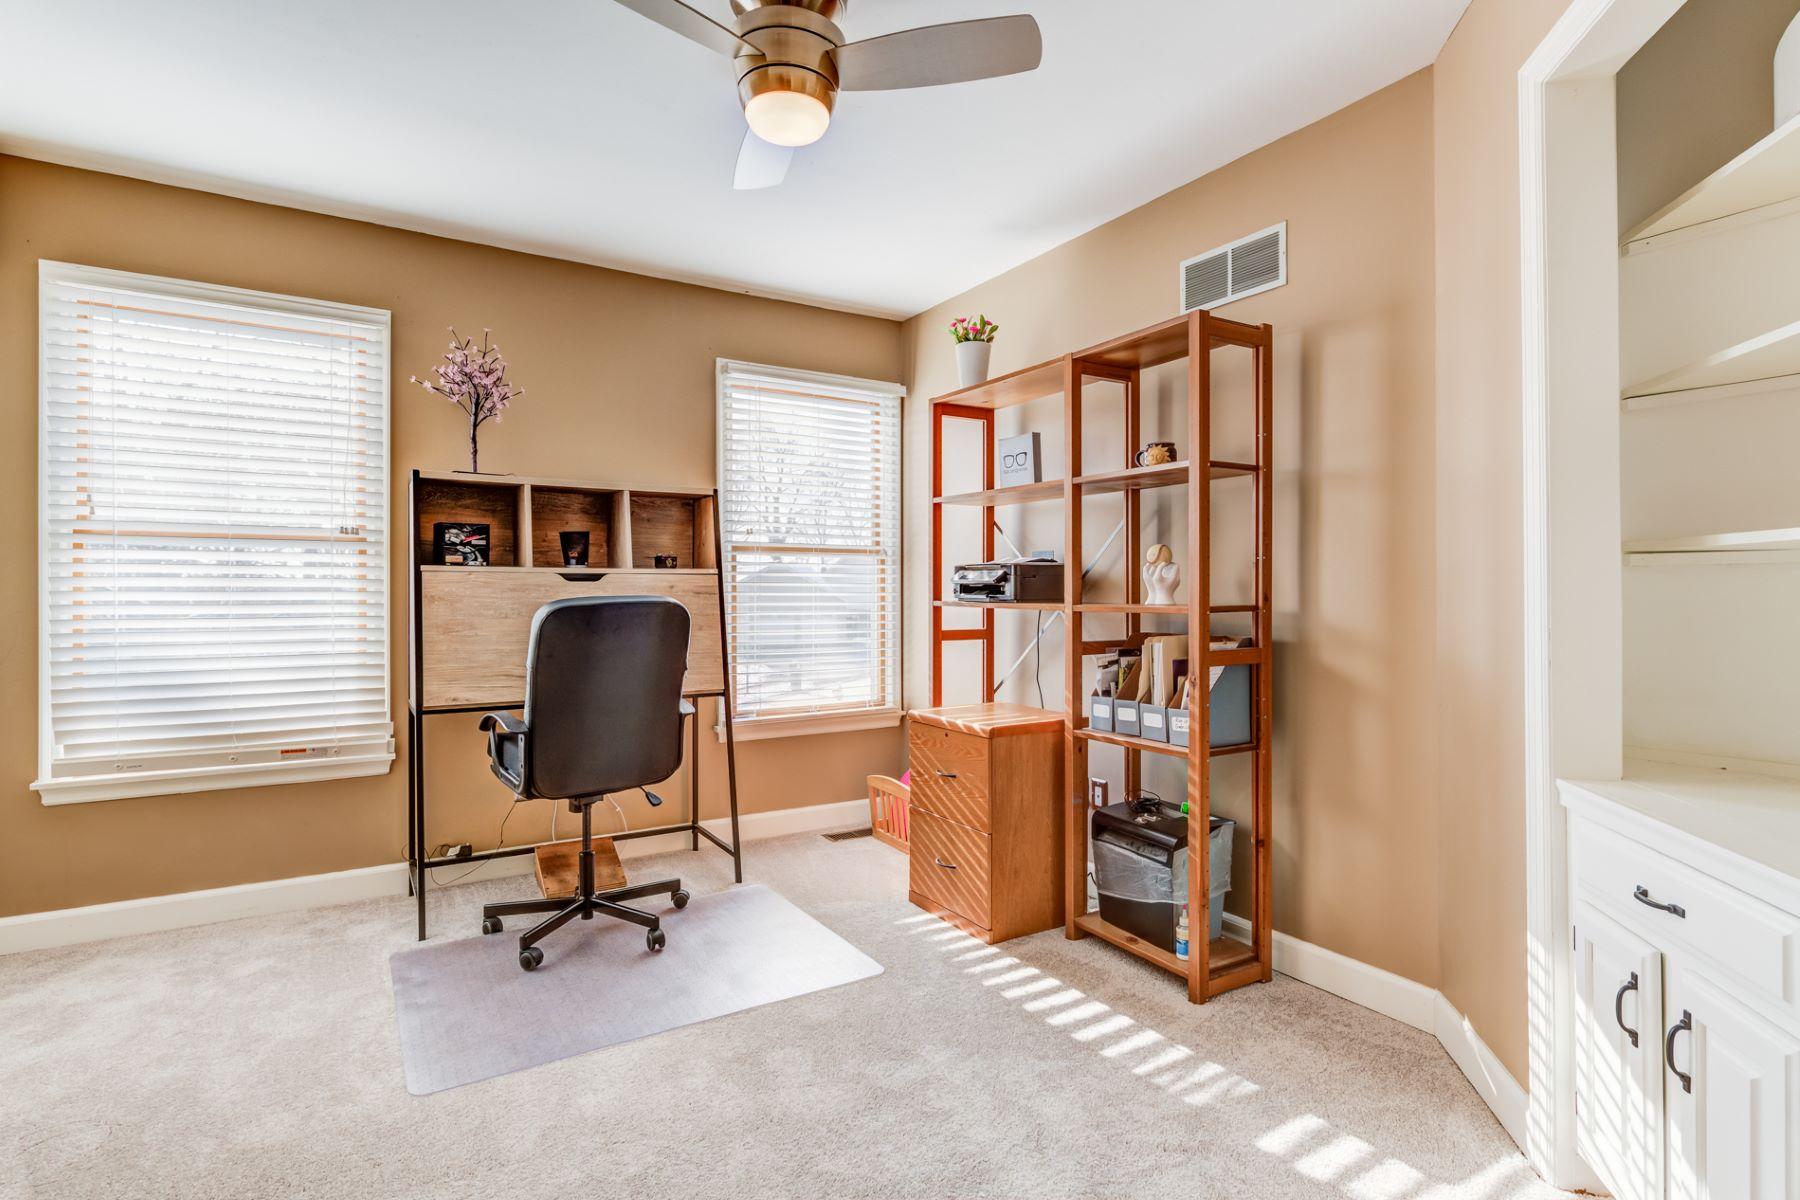 Additional photo for property listing at Bridge Creek Trail 1325 Bridge Creek Trail Ellisville, Missouri 63021 United States